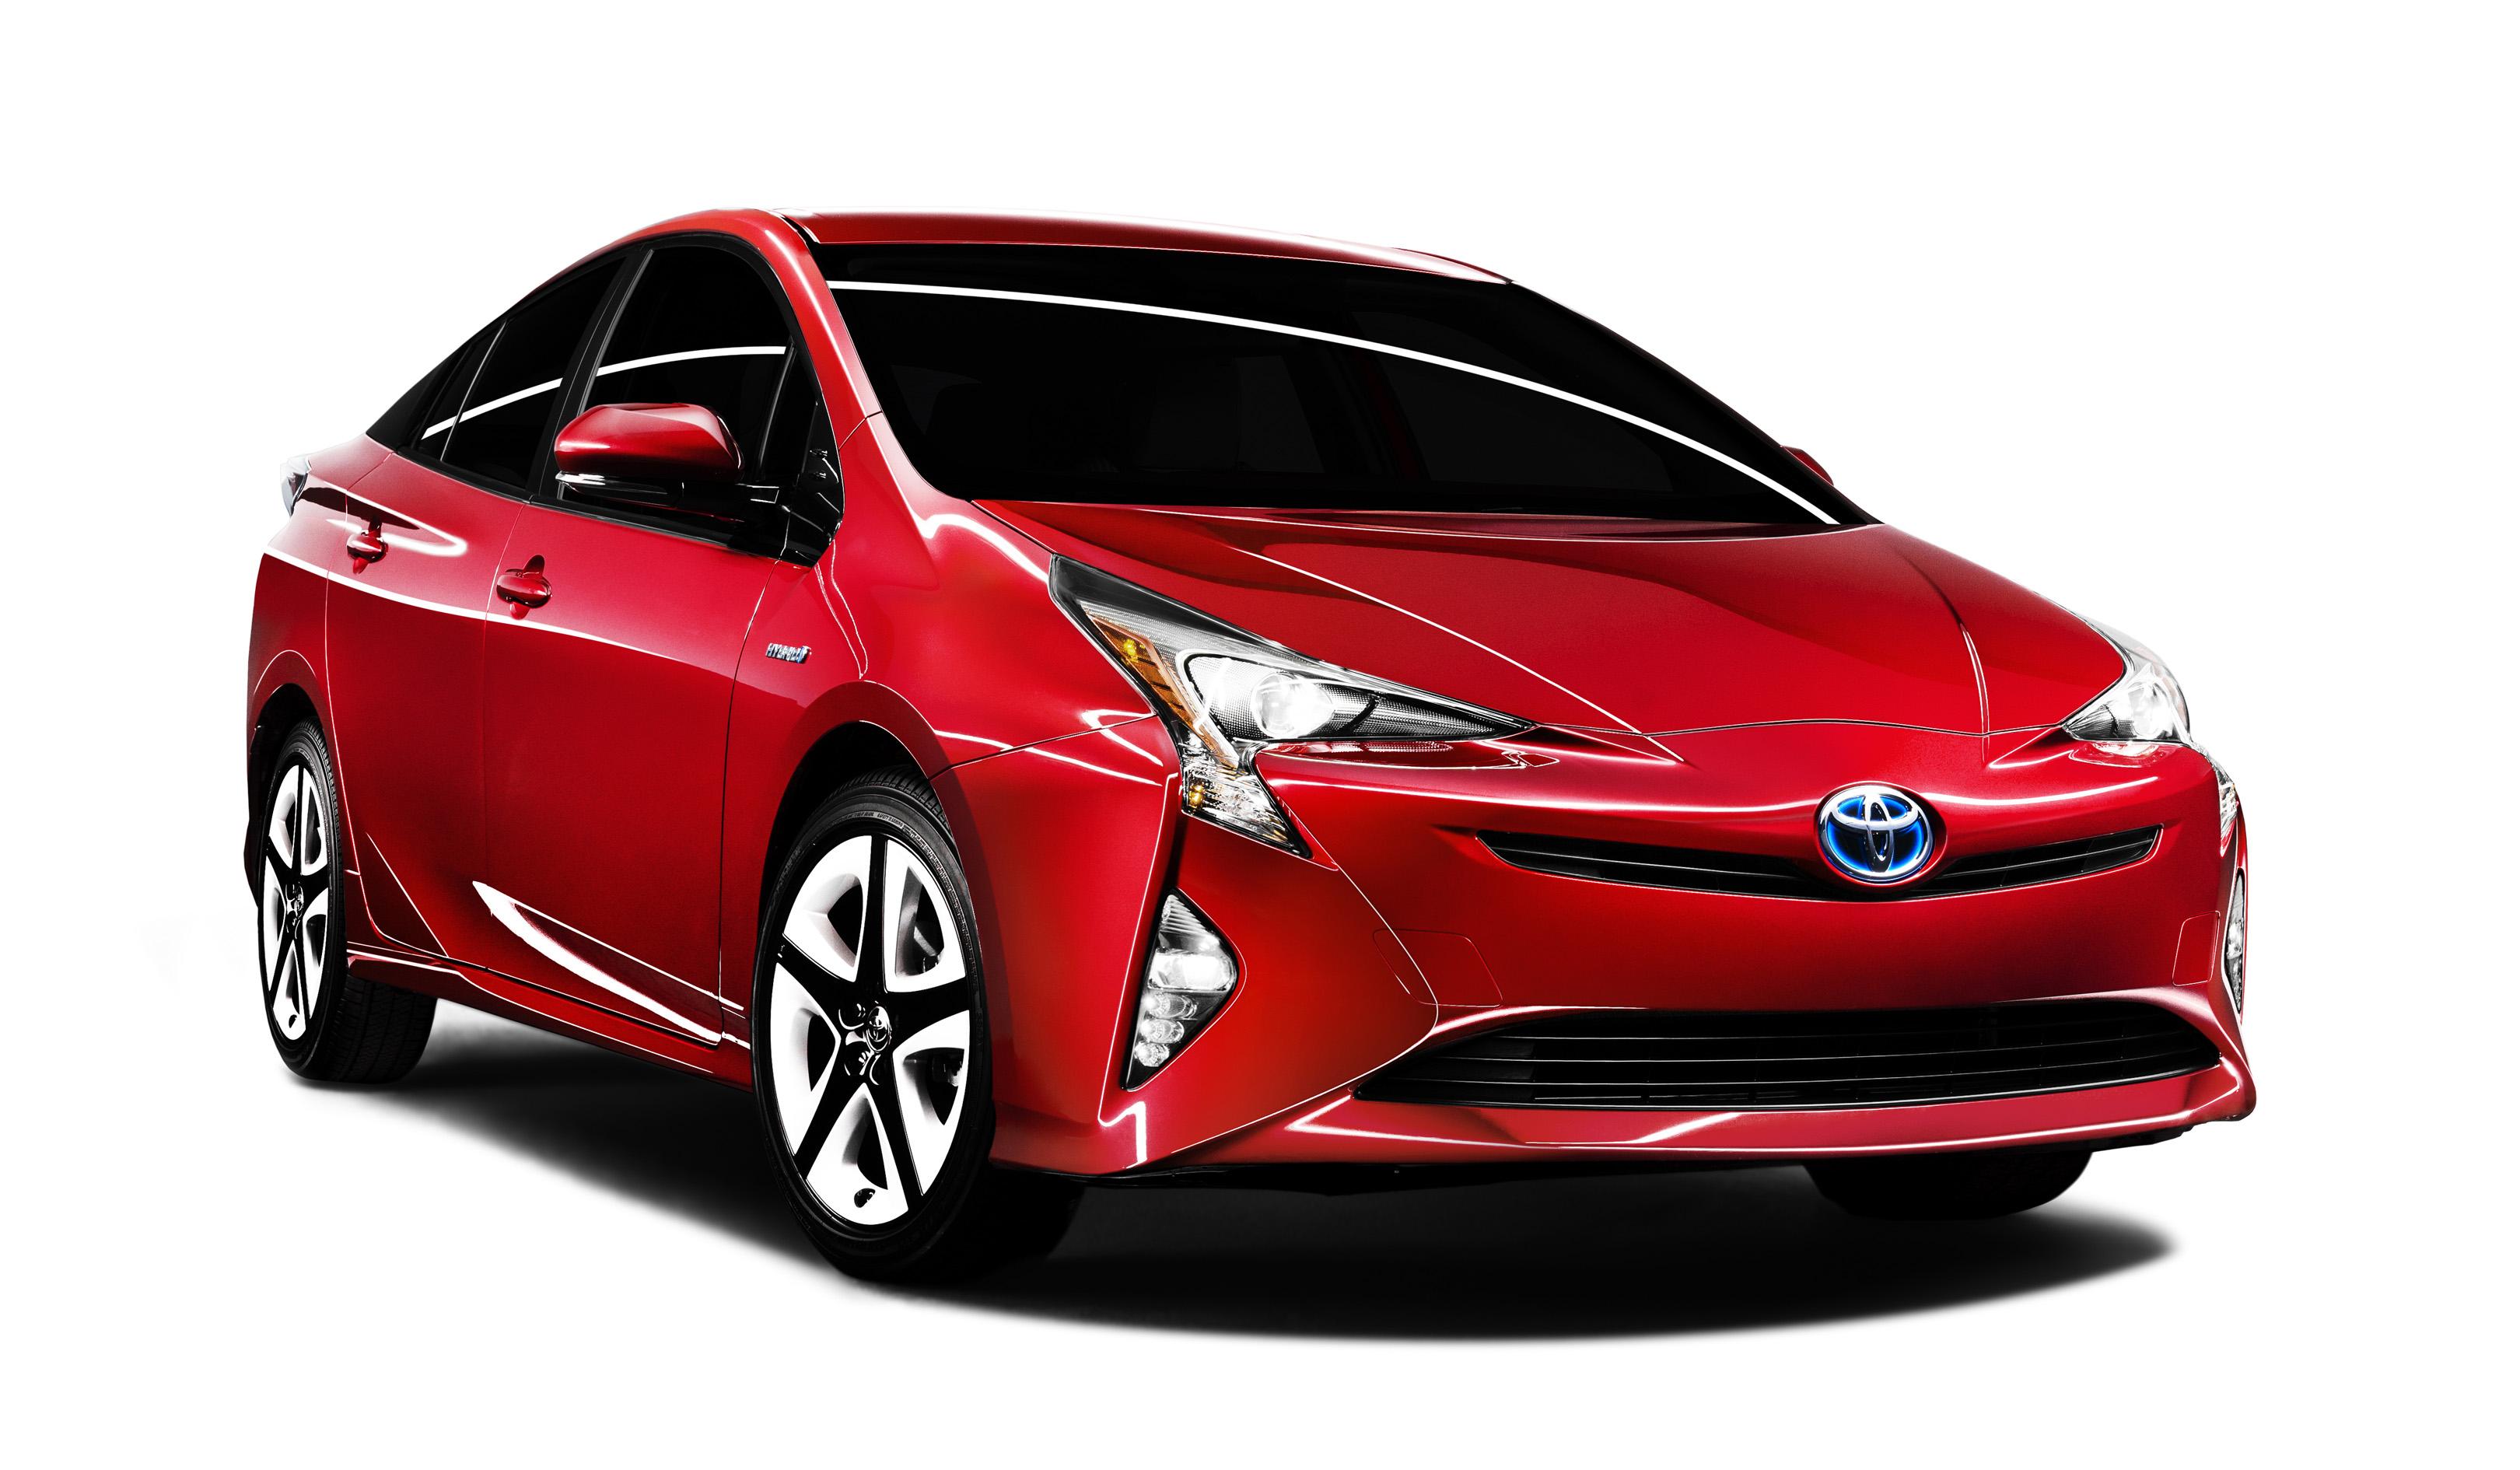 La nouvelle Toyota Prius 4